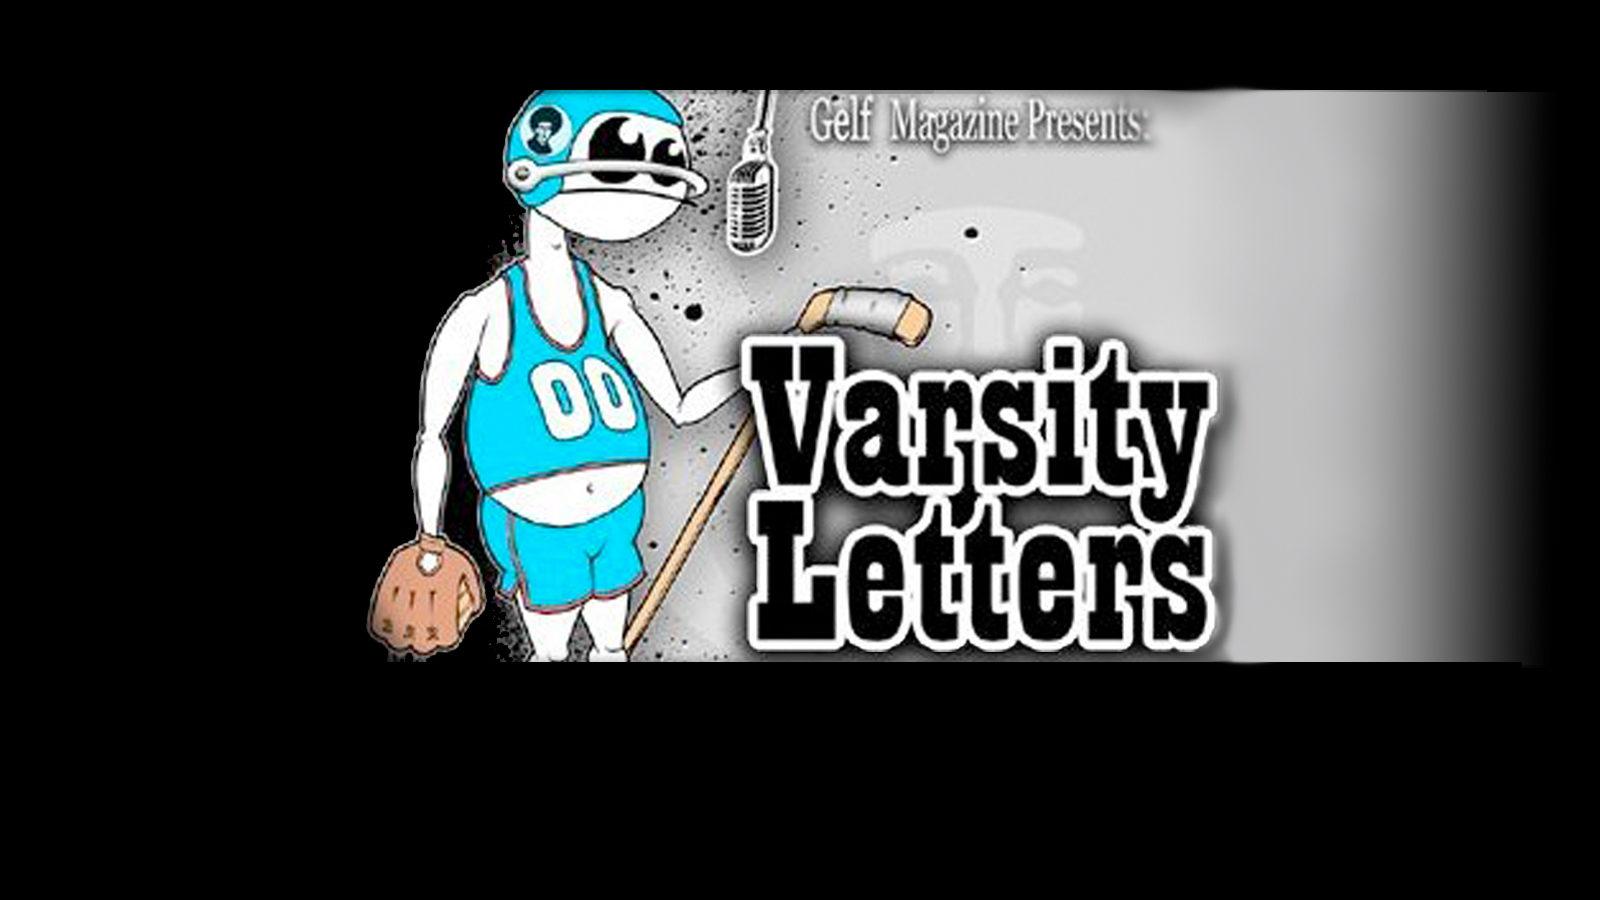 Gelf Magazine: Varsity Letters